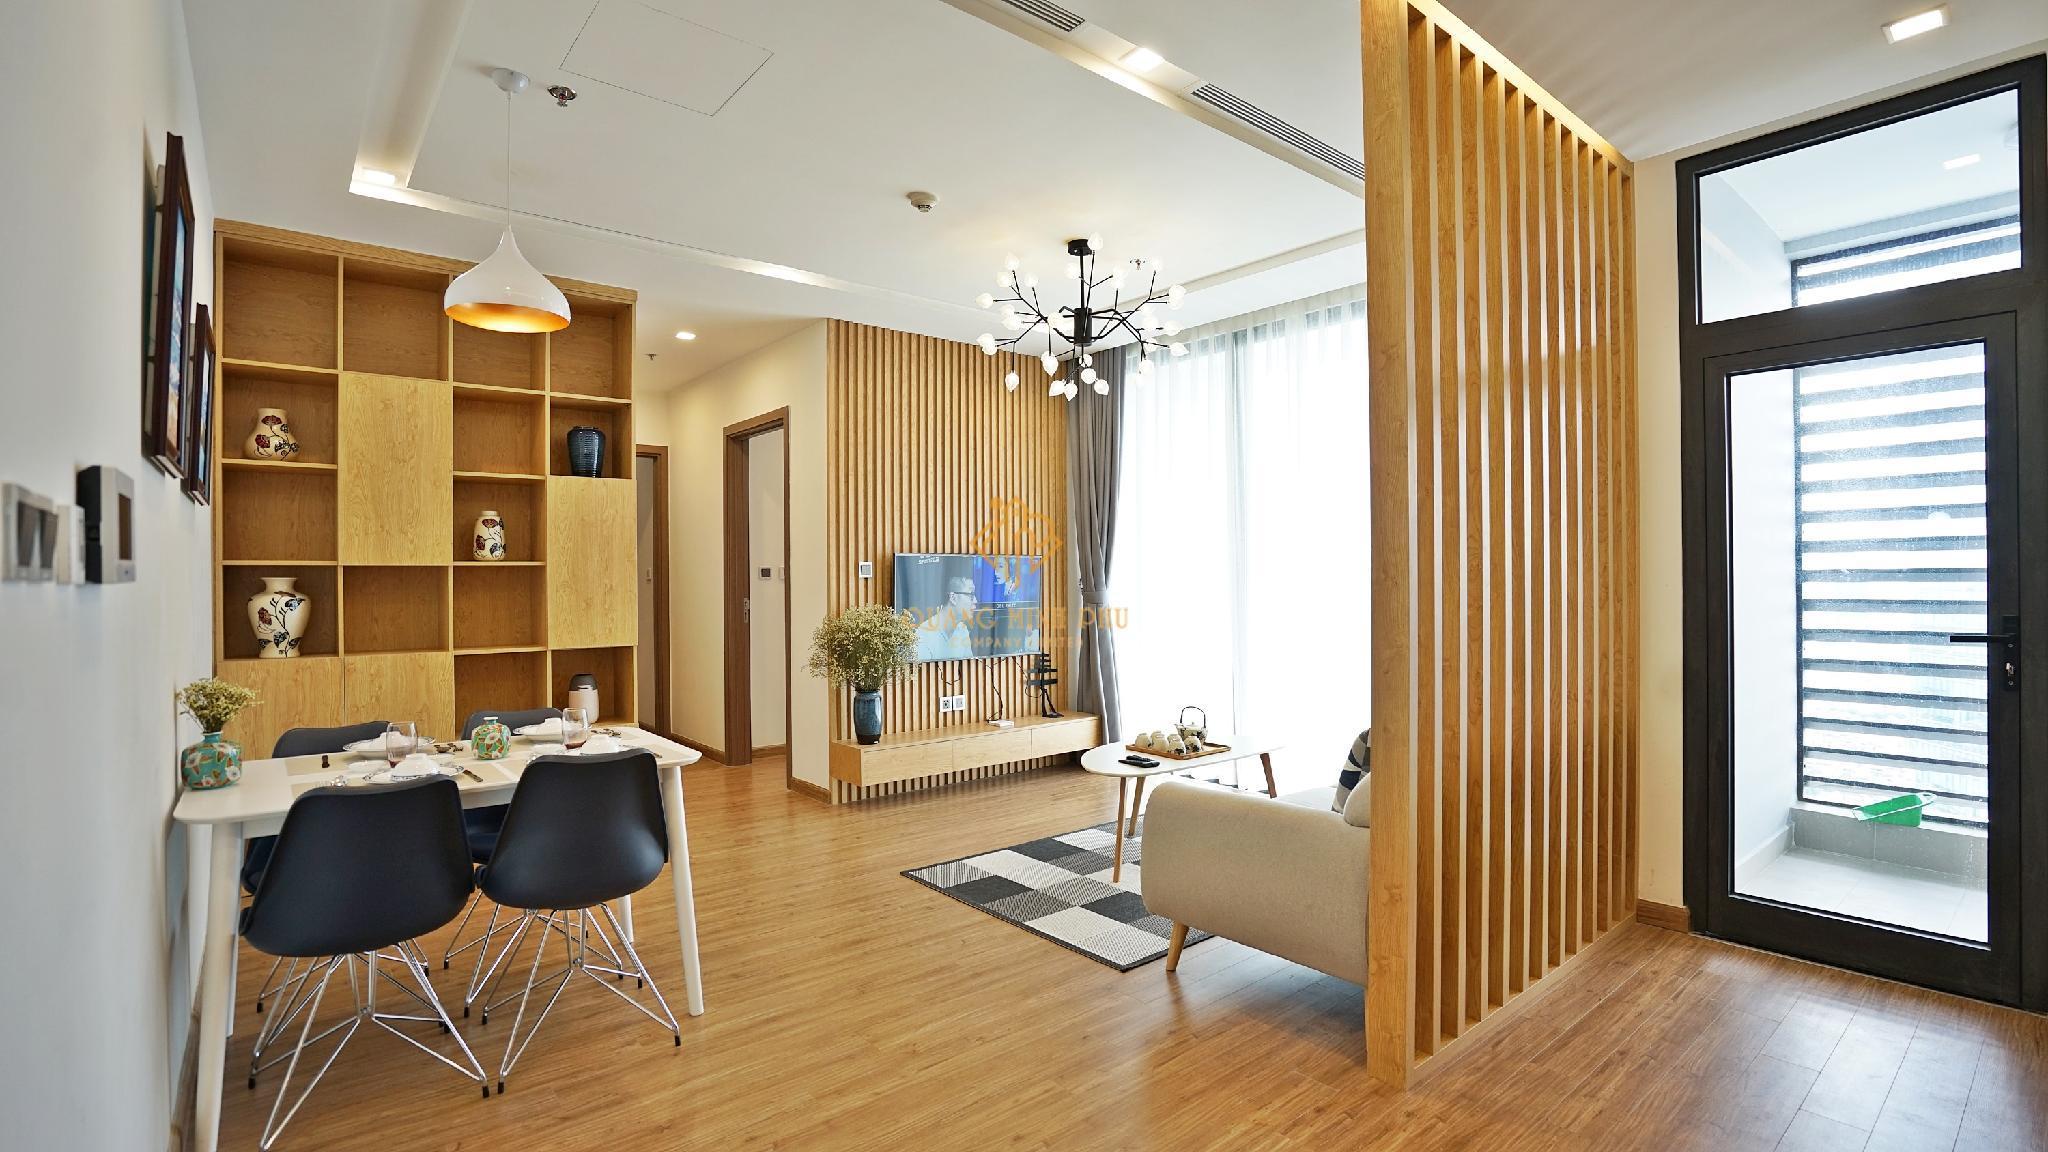 QMP 2 Bedrooms Apartment M1 39